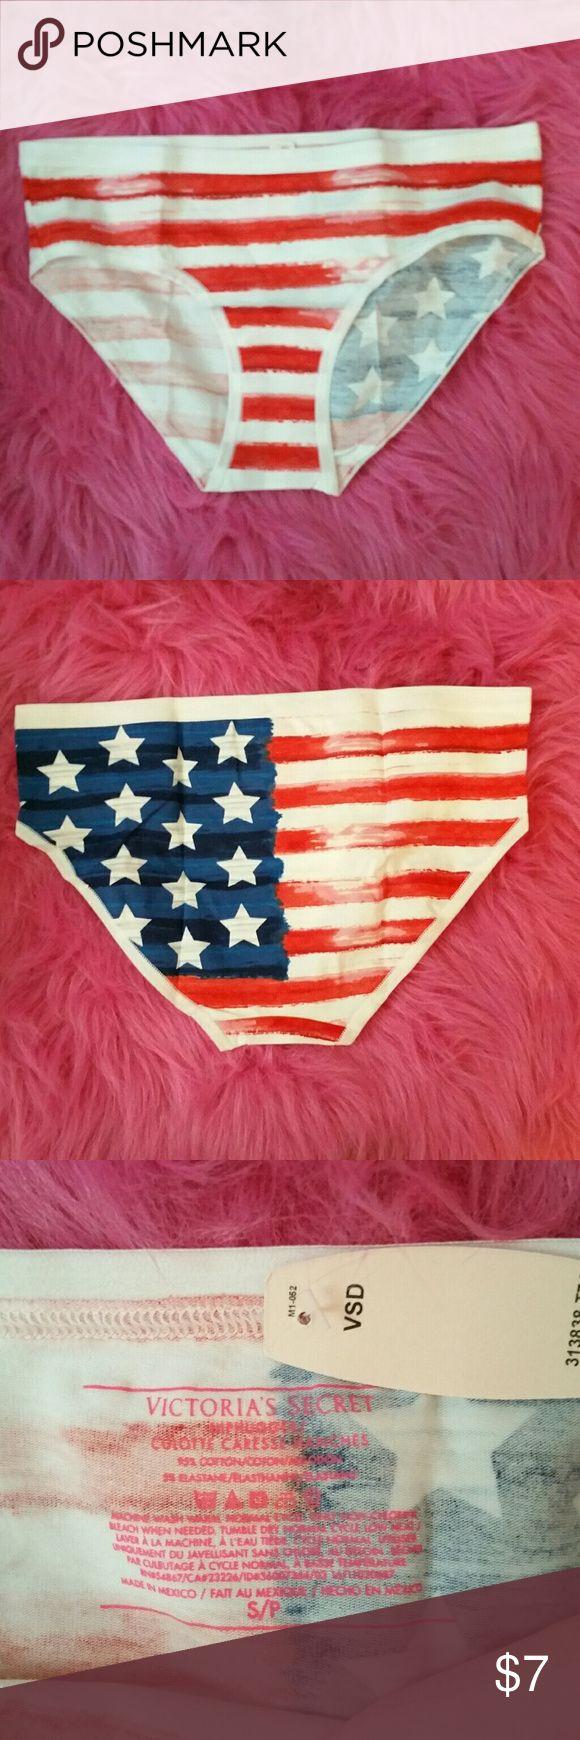 Victoria's Secret Hiphugger New Taken out for pictures Victoria's Secret Intimates & Sleepwear Panties